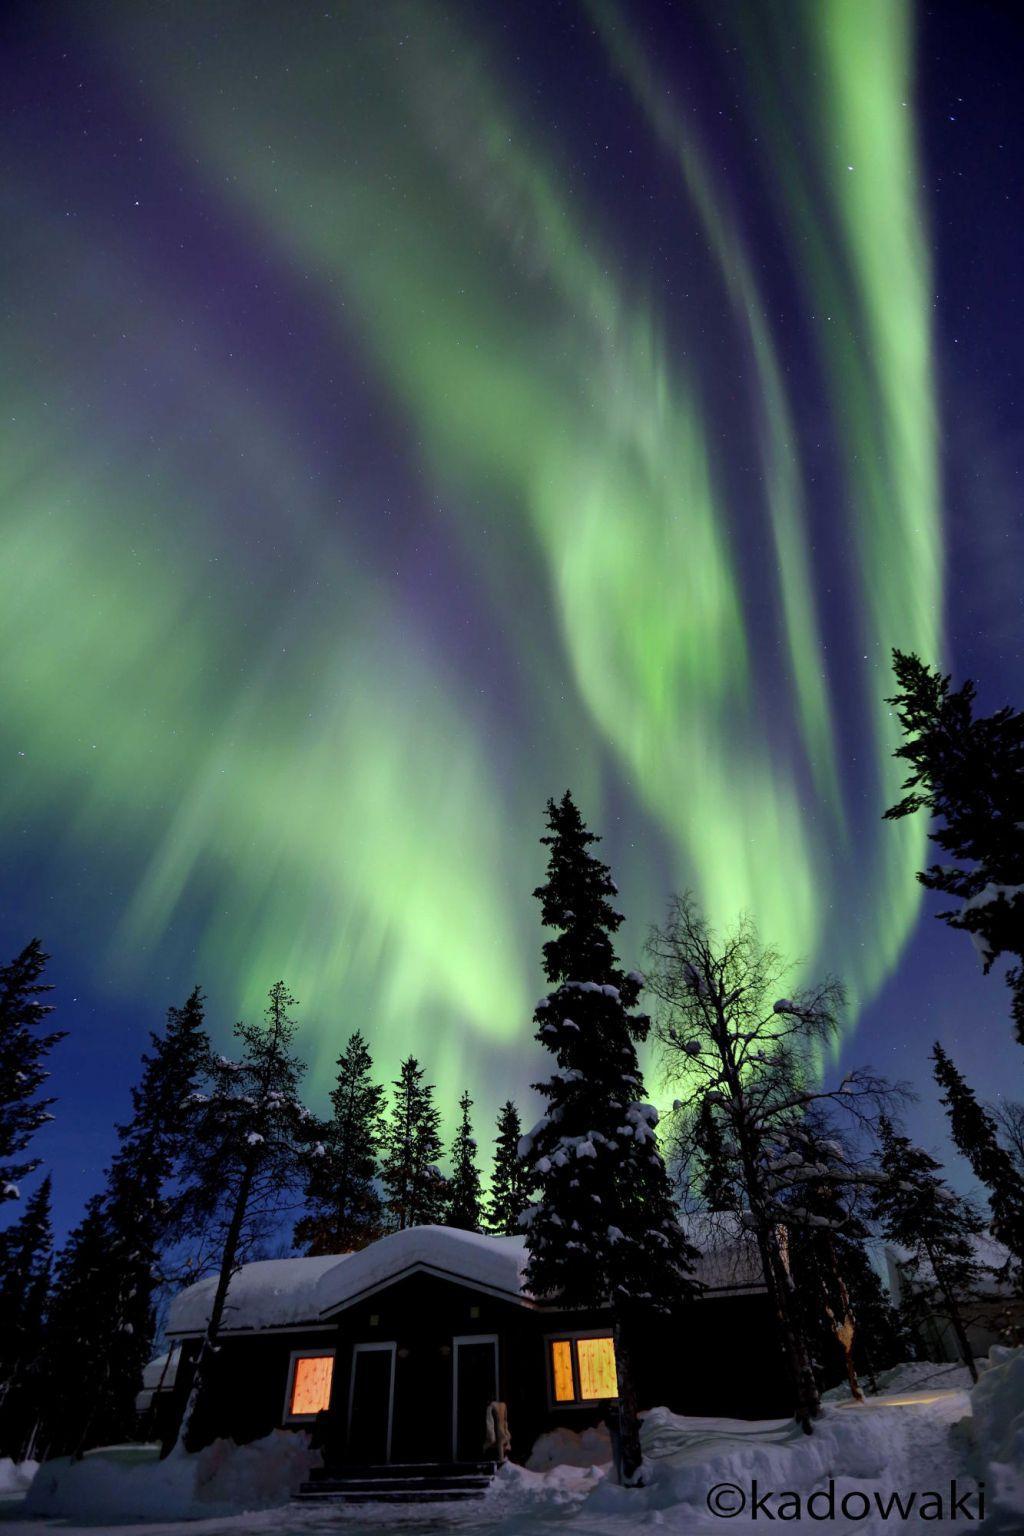 Auroras over a snowy cabin